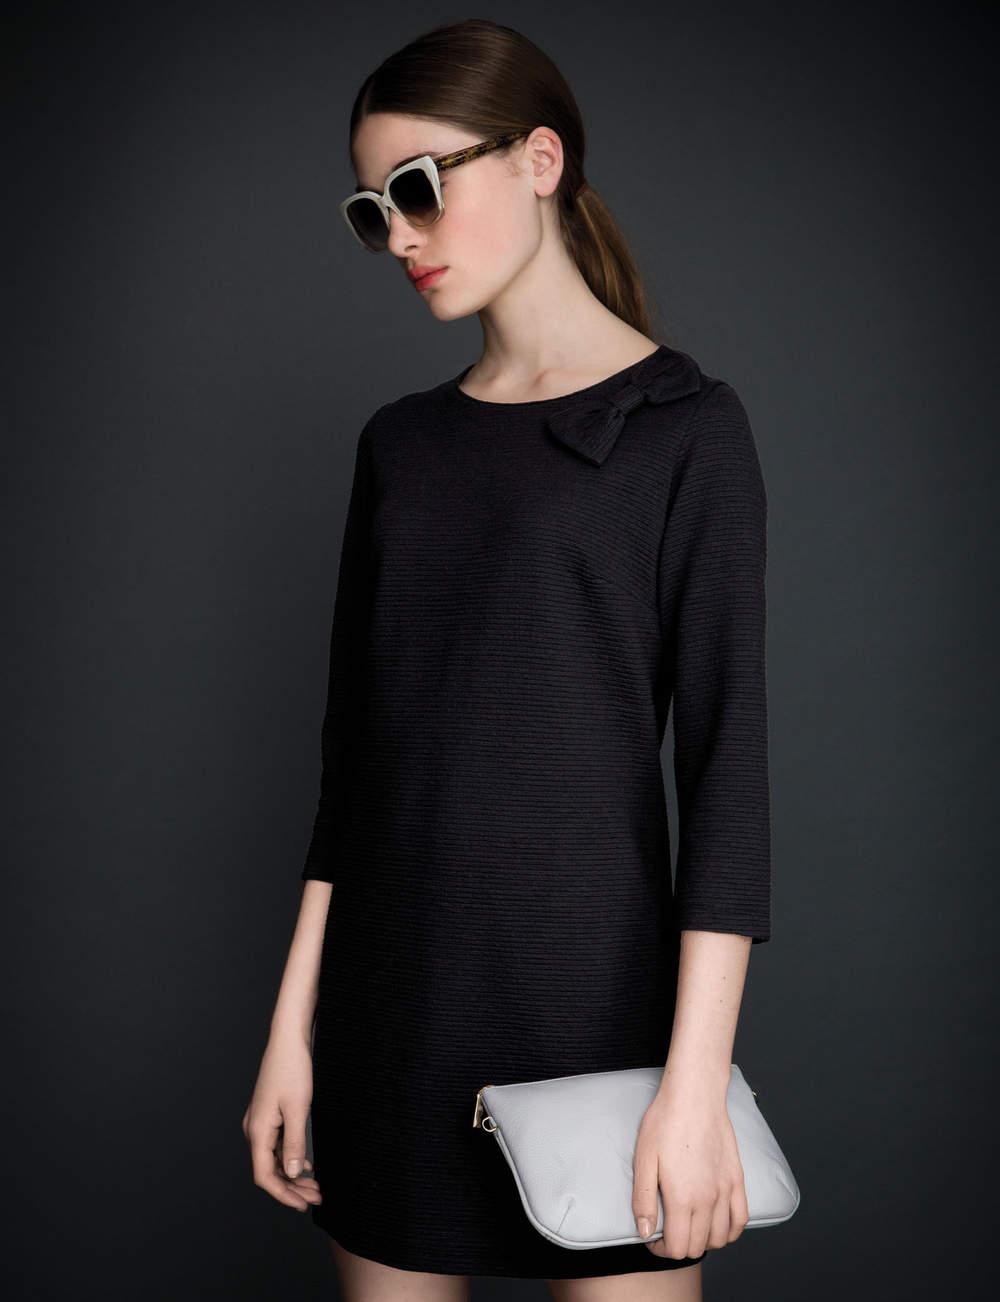 Robe noire : nœud